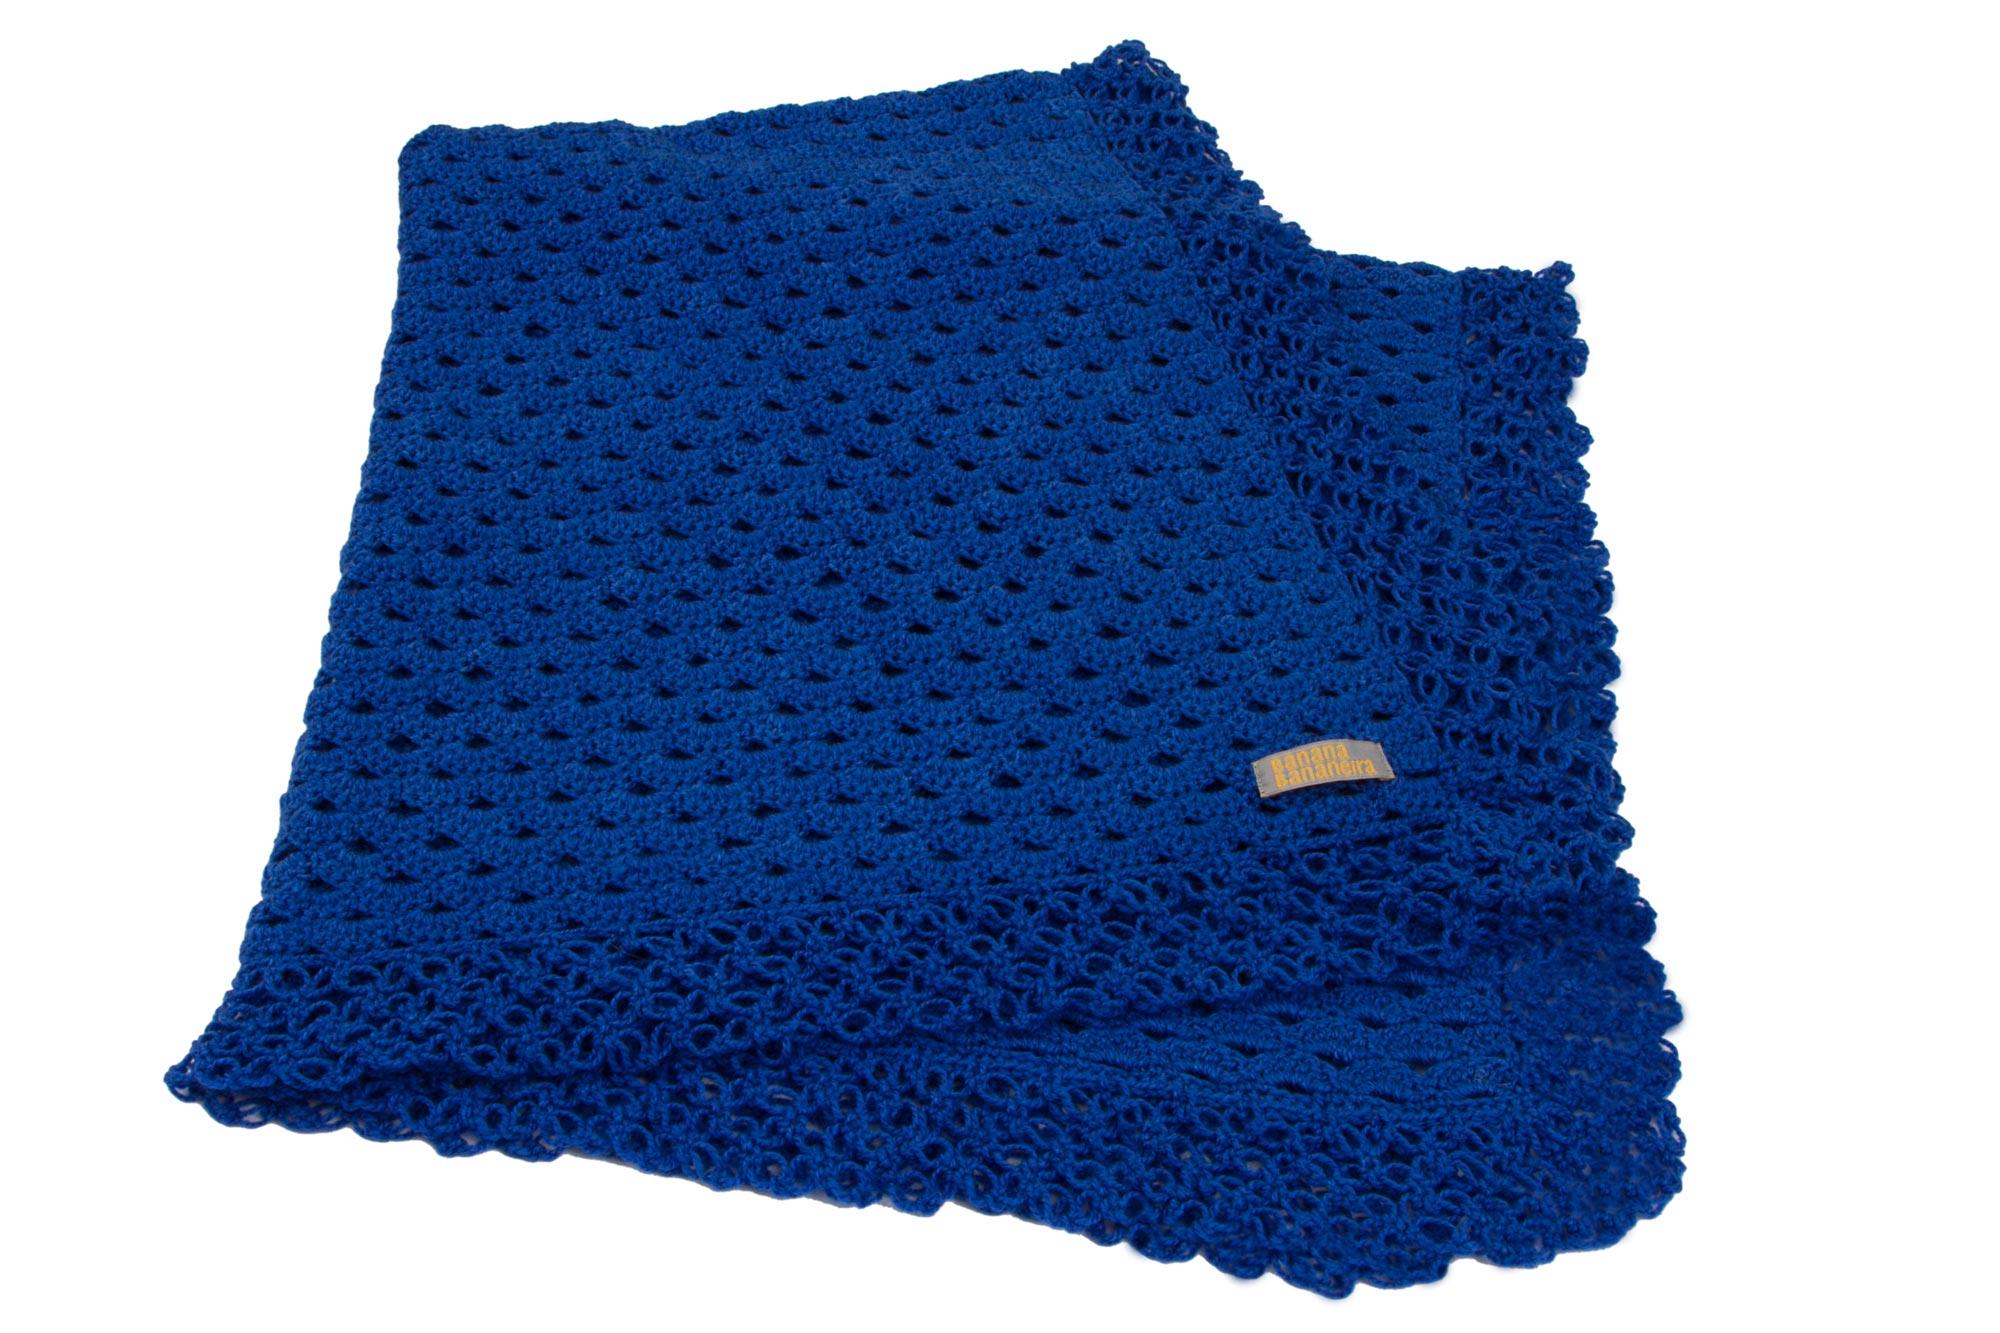 Manta de crochê renda azul royal